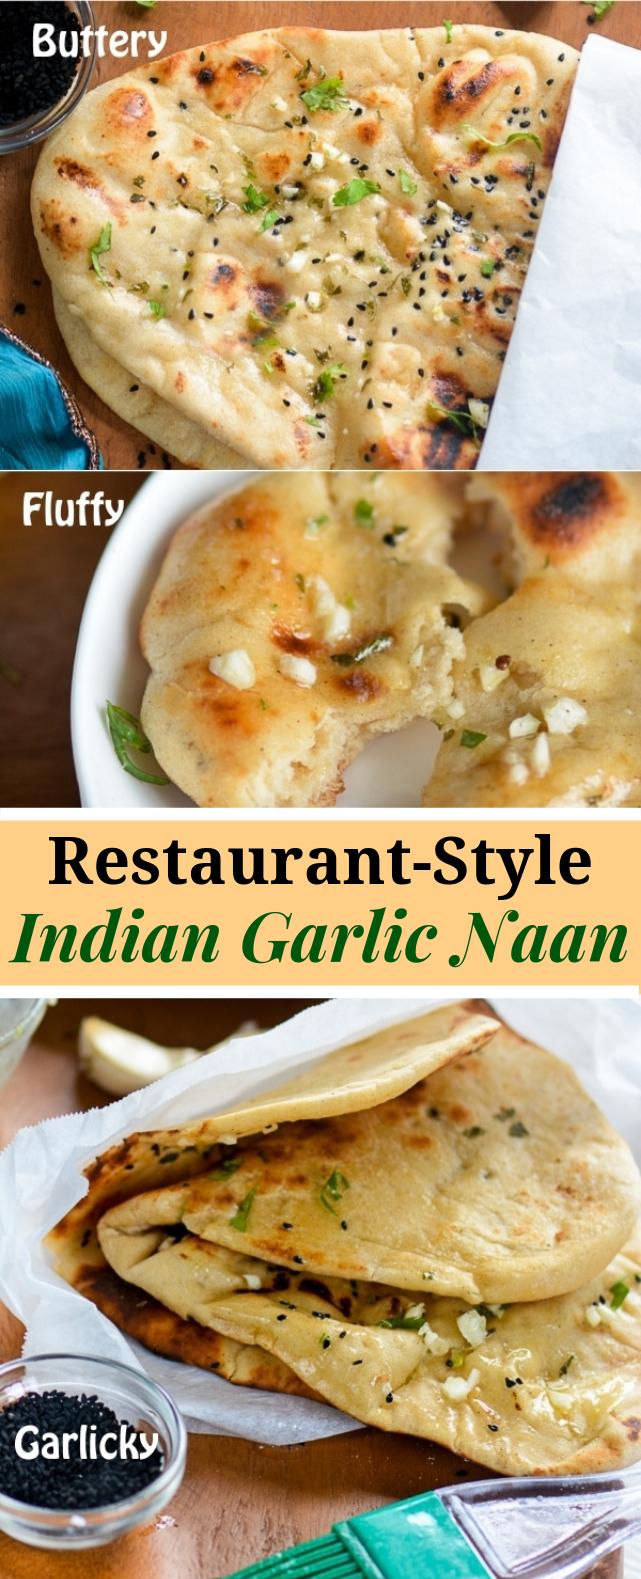 Homemade Restaurant-Style Indian Garlic Naan #indianbreads #indianfood #indianfood Homemade Restaurant-Style Indian Garlic Naan #indianbreads #indianfood #indianfood